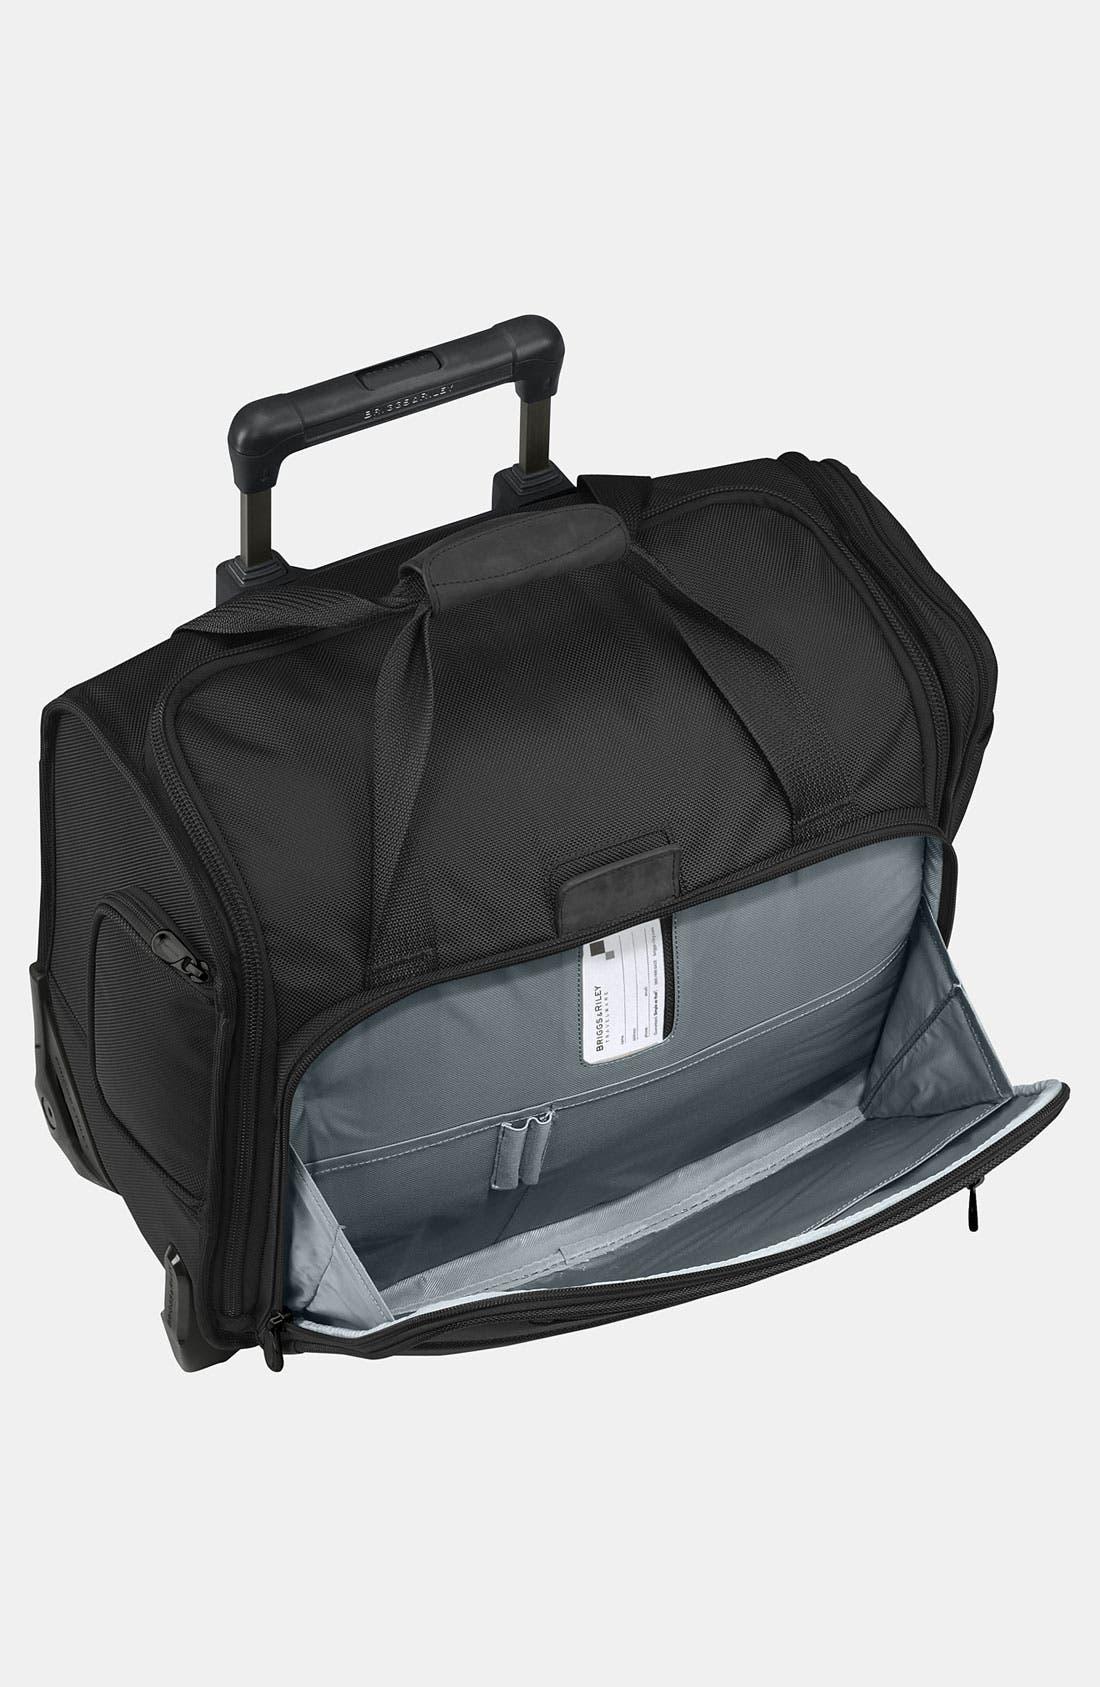 Alternate Image 2  - Briggs & Riley 'Baseline' Rolling Cabin Bag (16 Inch)